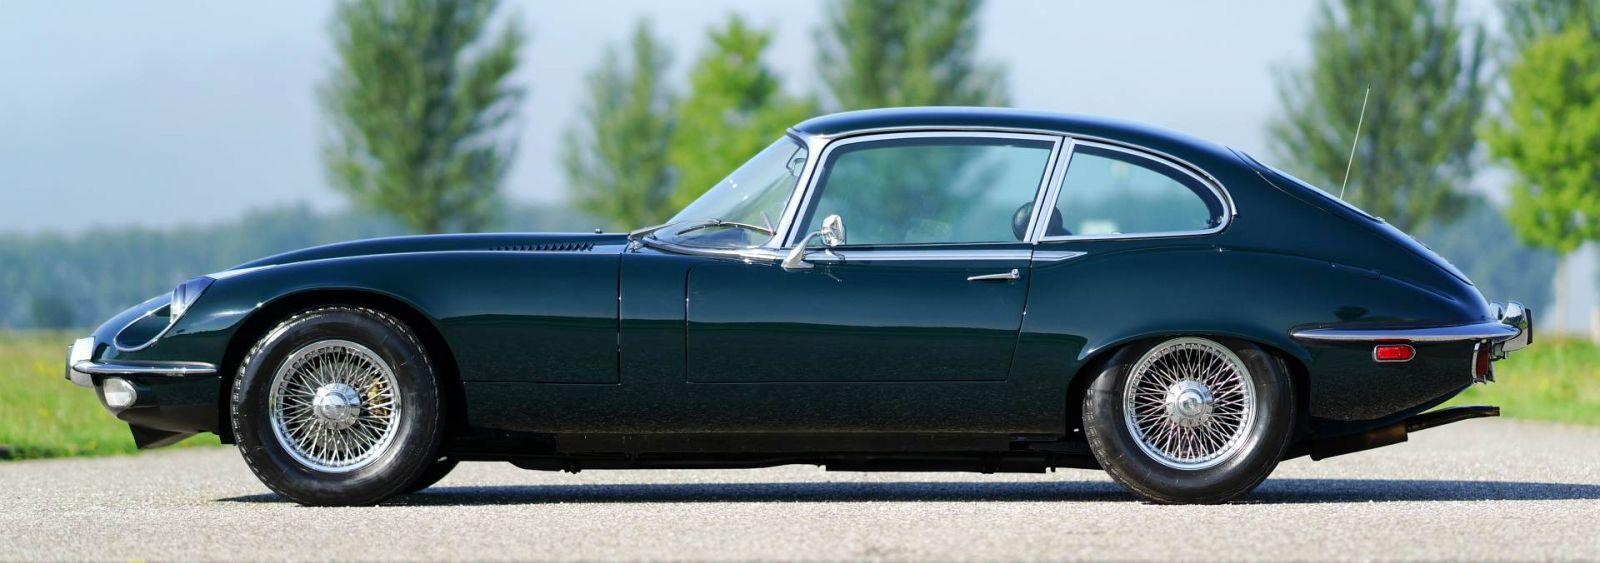 jaguar e-type v12 2+2 fhc, 1970 - classicargarage - de